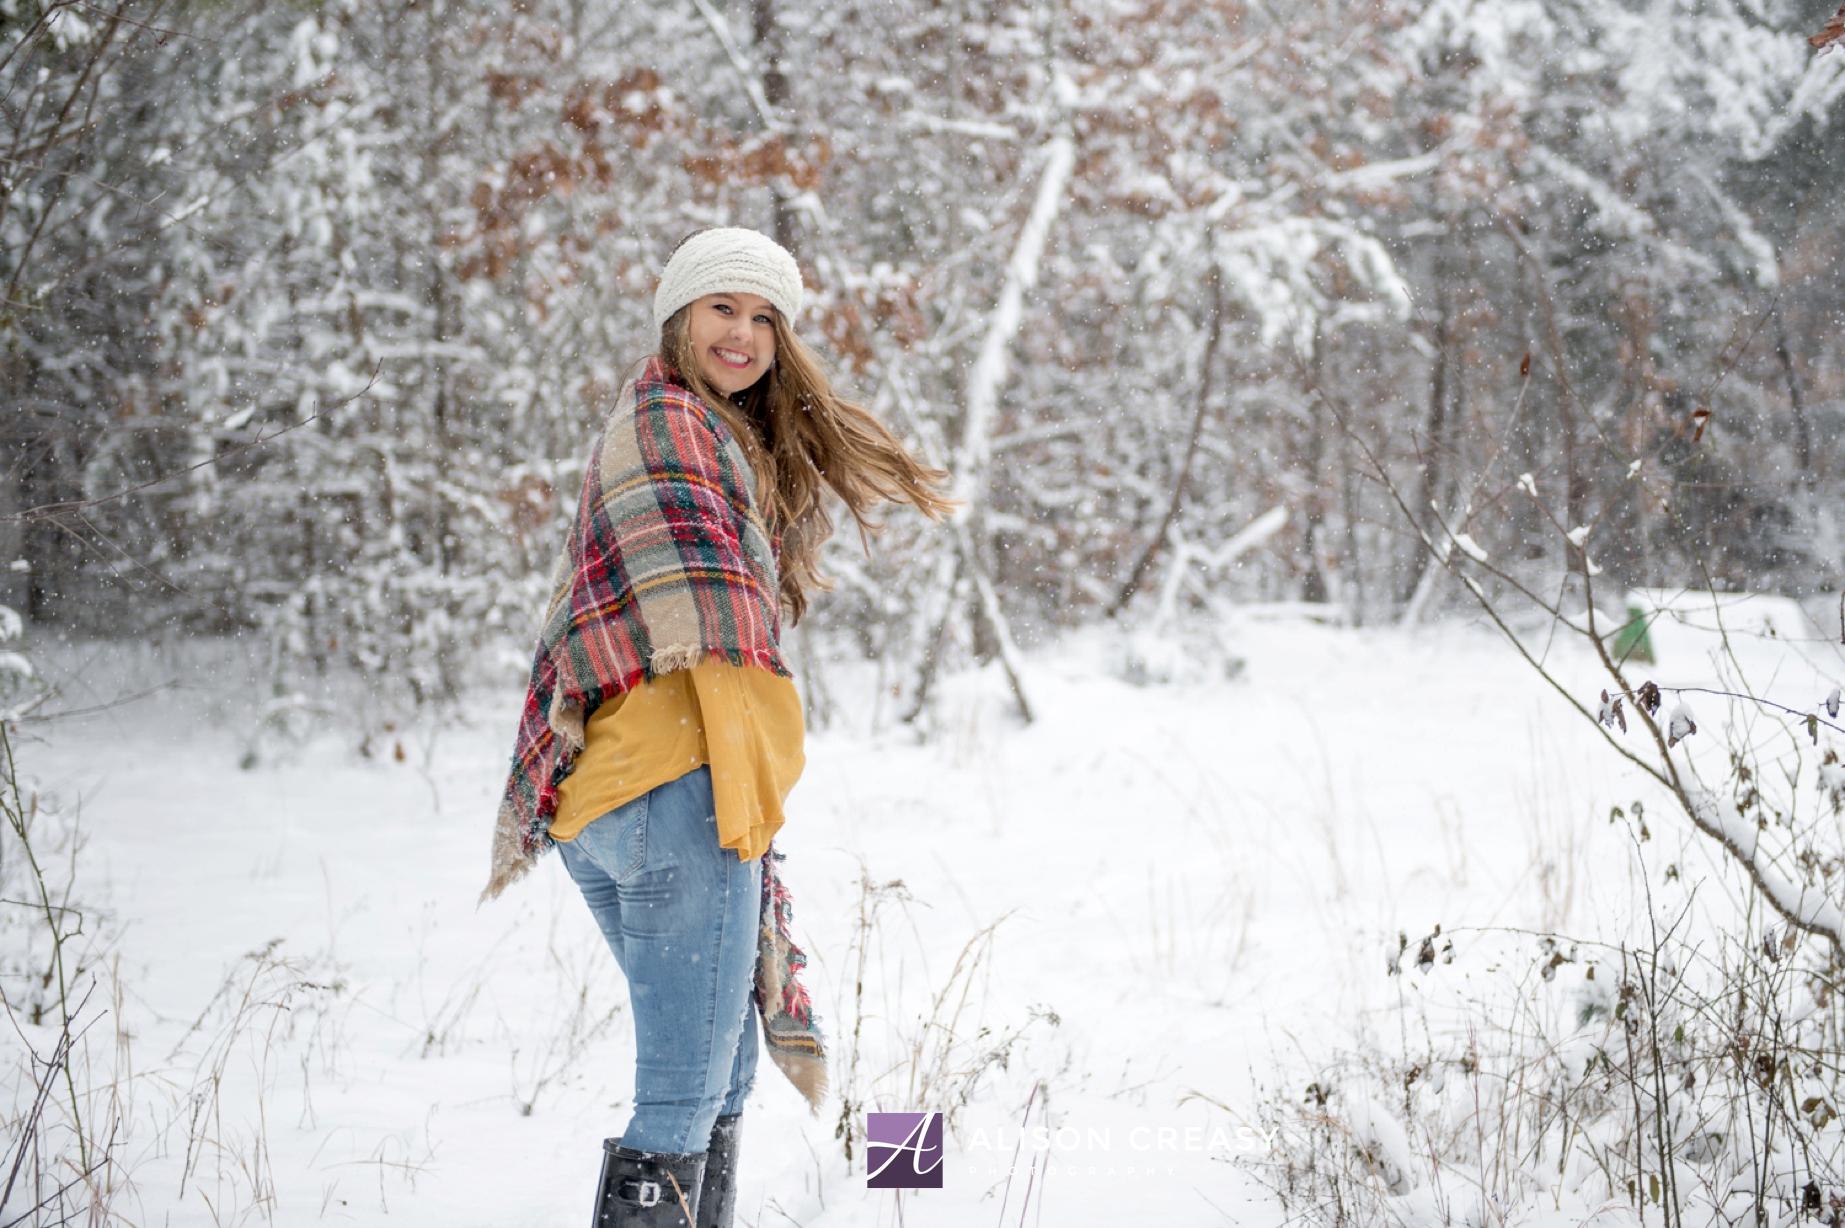 Alison-Creasy-Photography-Lynchburg-VA-Senior-Photographer_0019.jpg